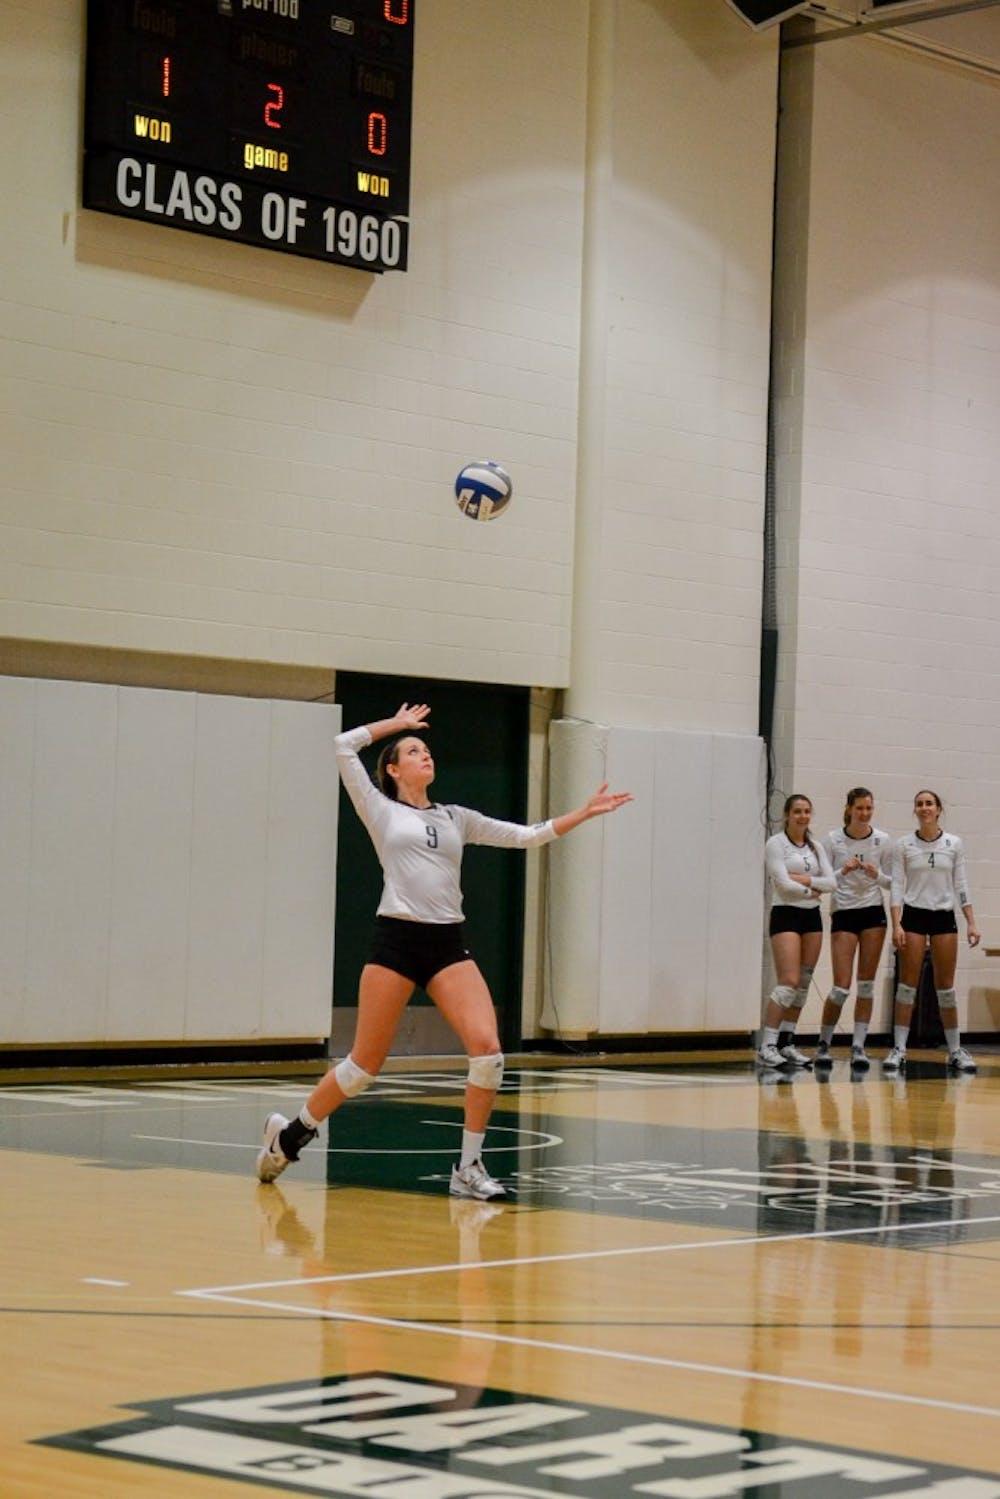 9-16-15-sports-volleyballstock-elizamcdonough